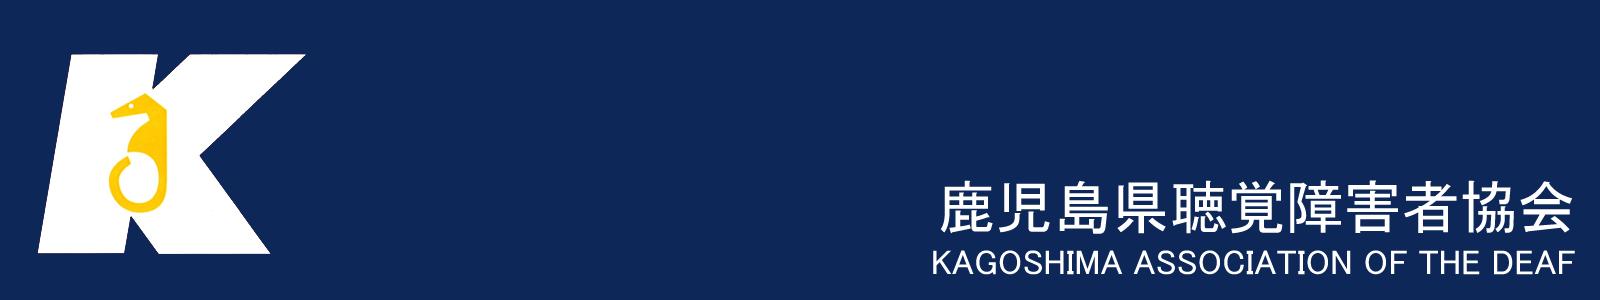 一般社団法人 鹿児島県聴覚障害者協会 公式ホームページ